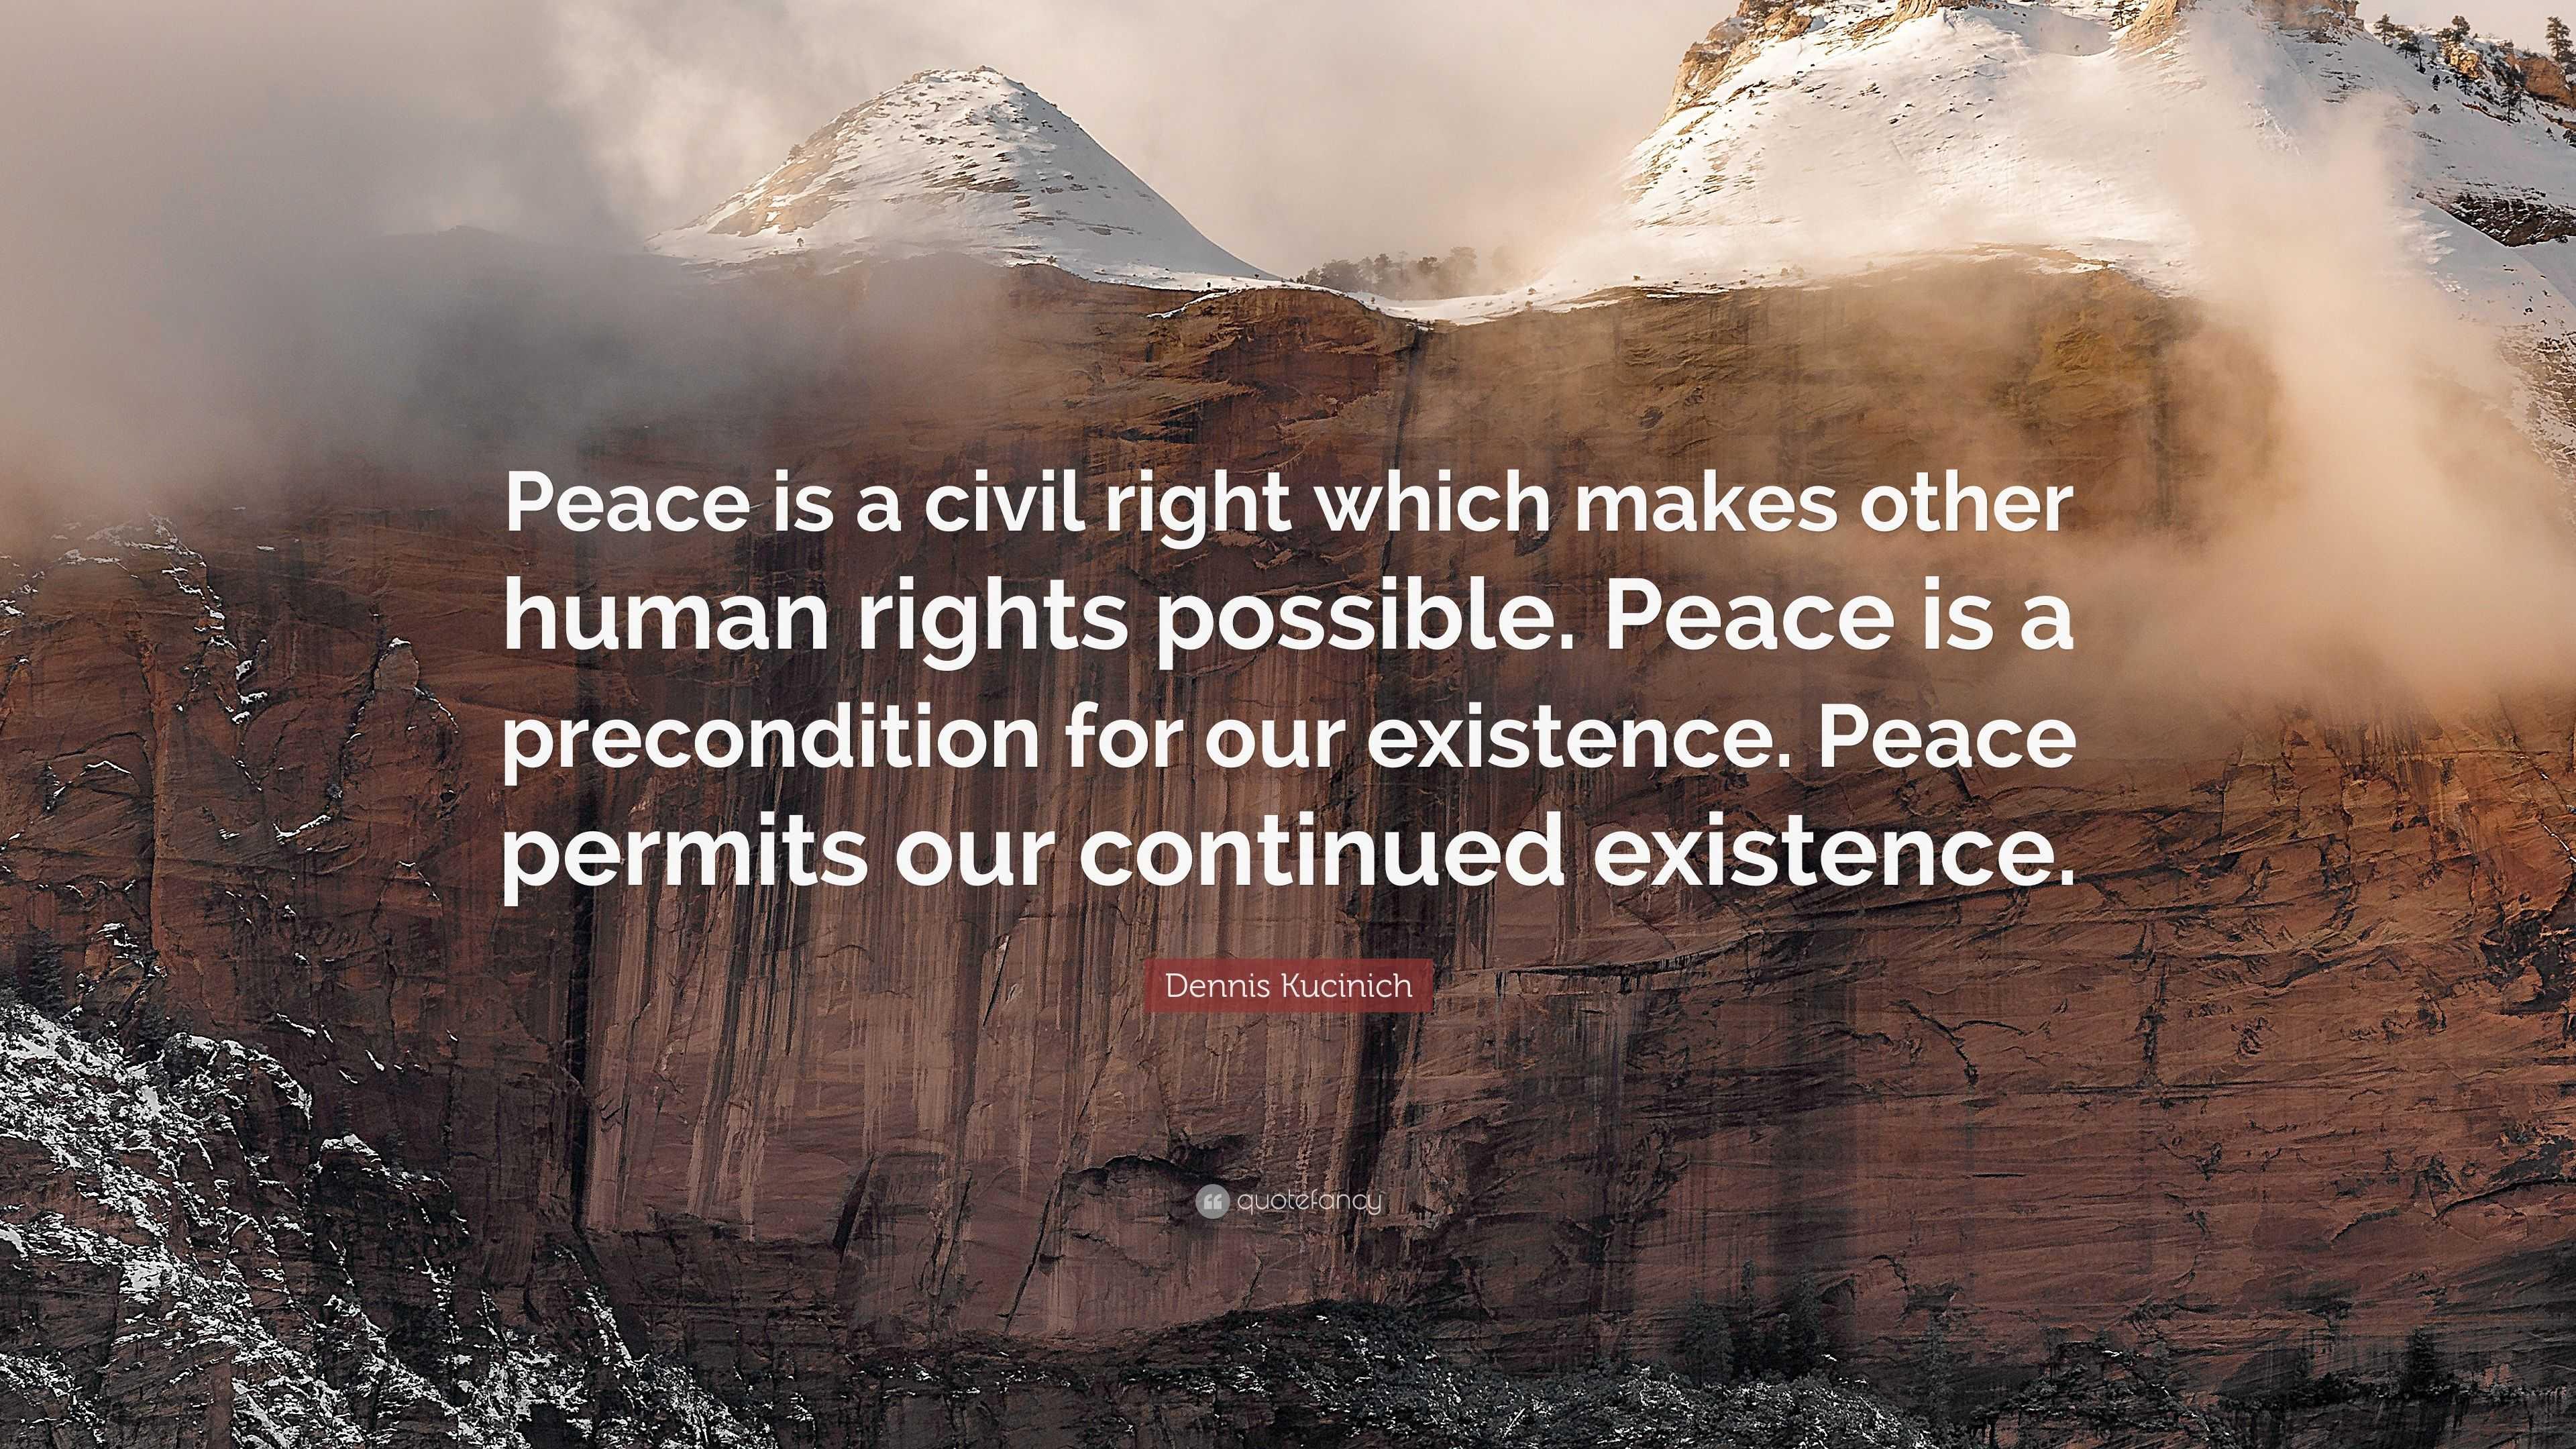 Dennis Kucinich Peace